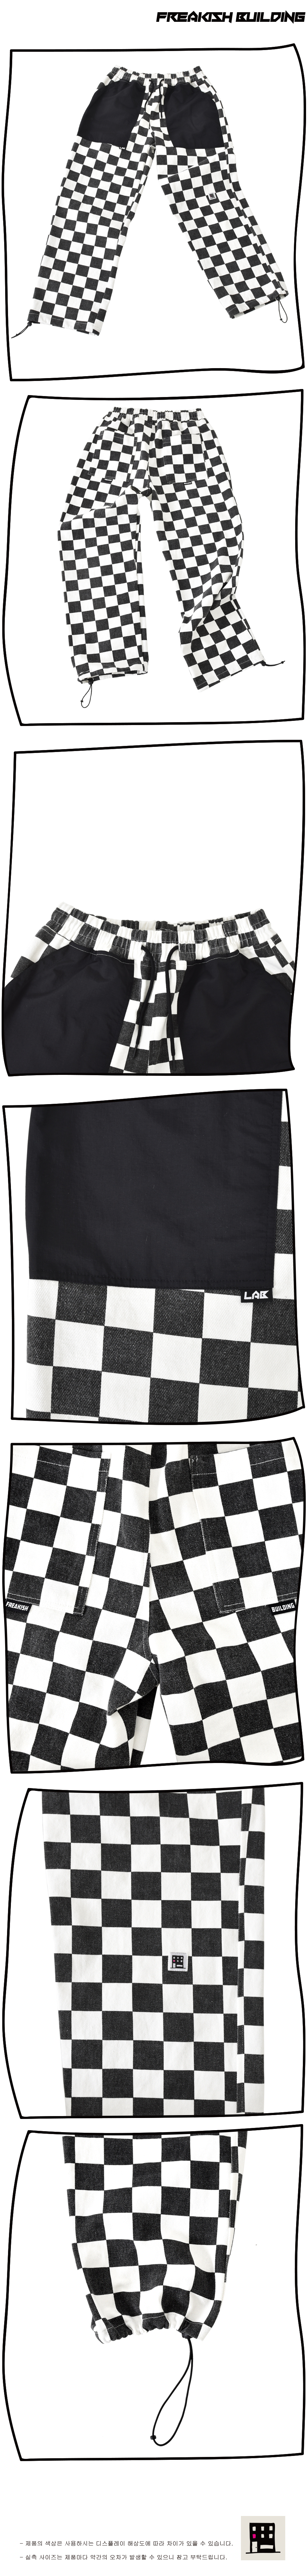 #15 RON CHECKER LONG PANTS (BLACK) 03.jpg